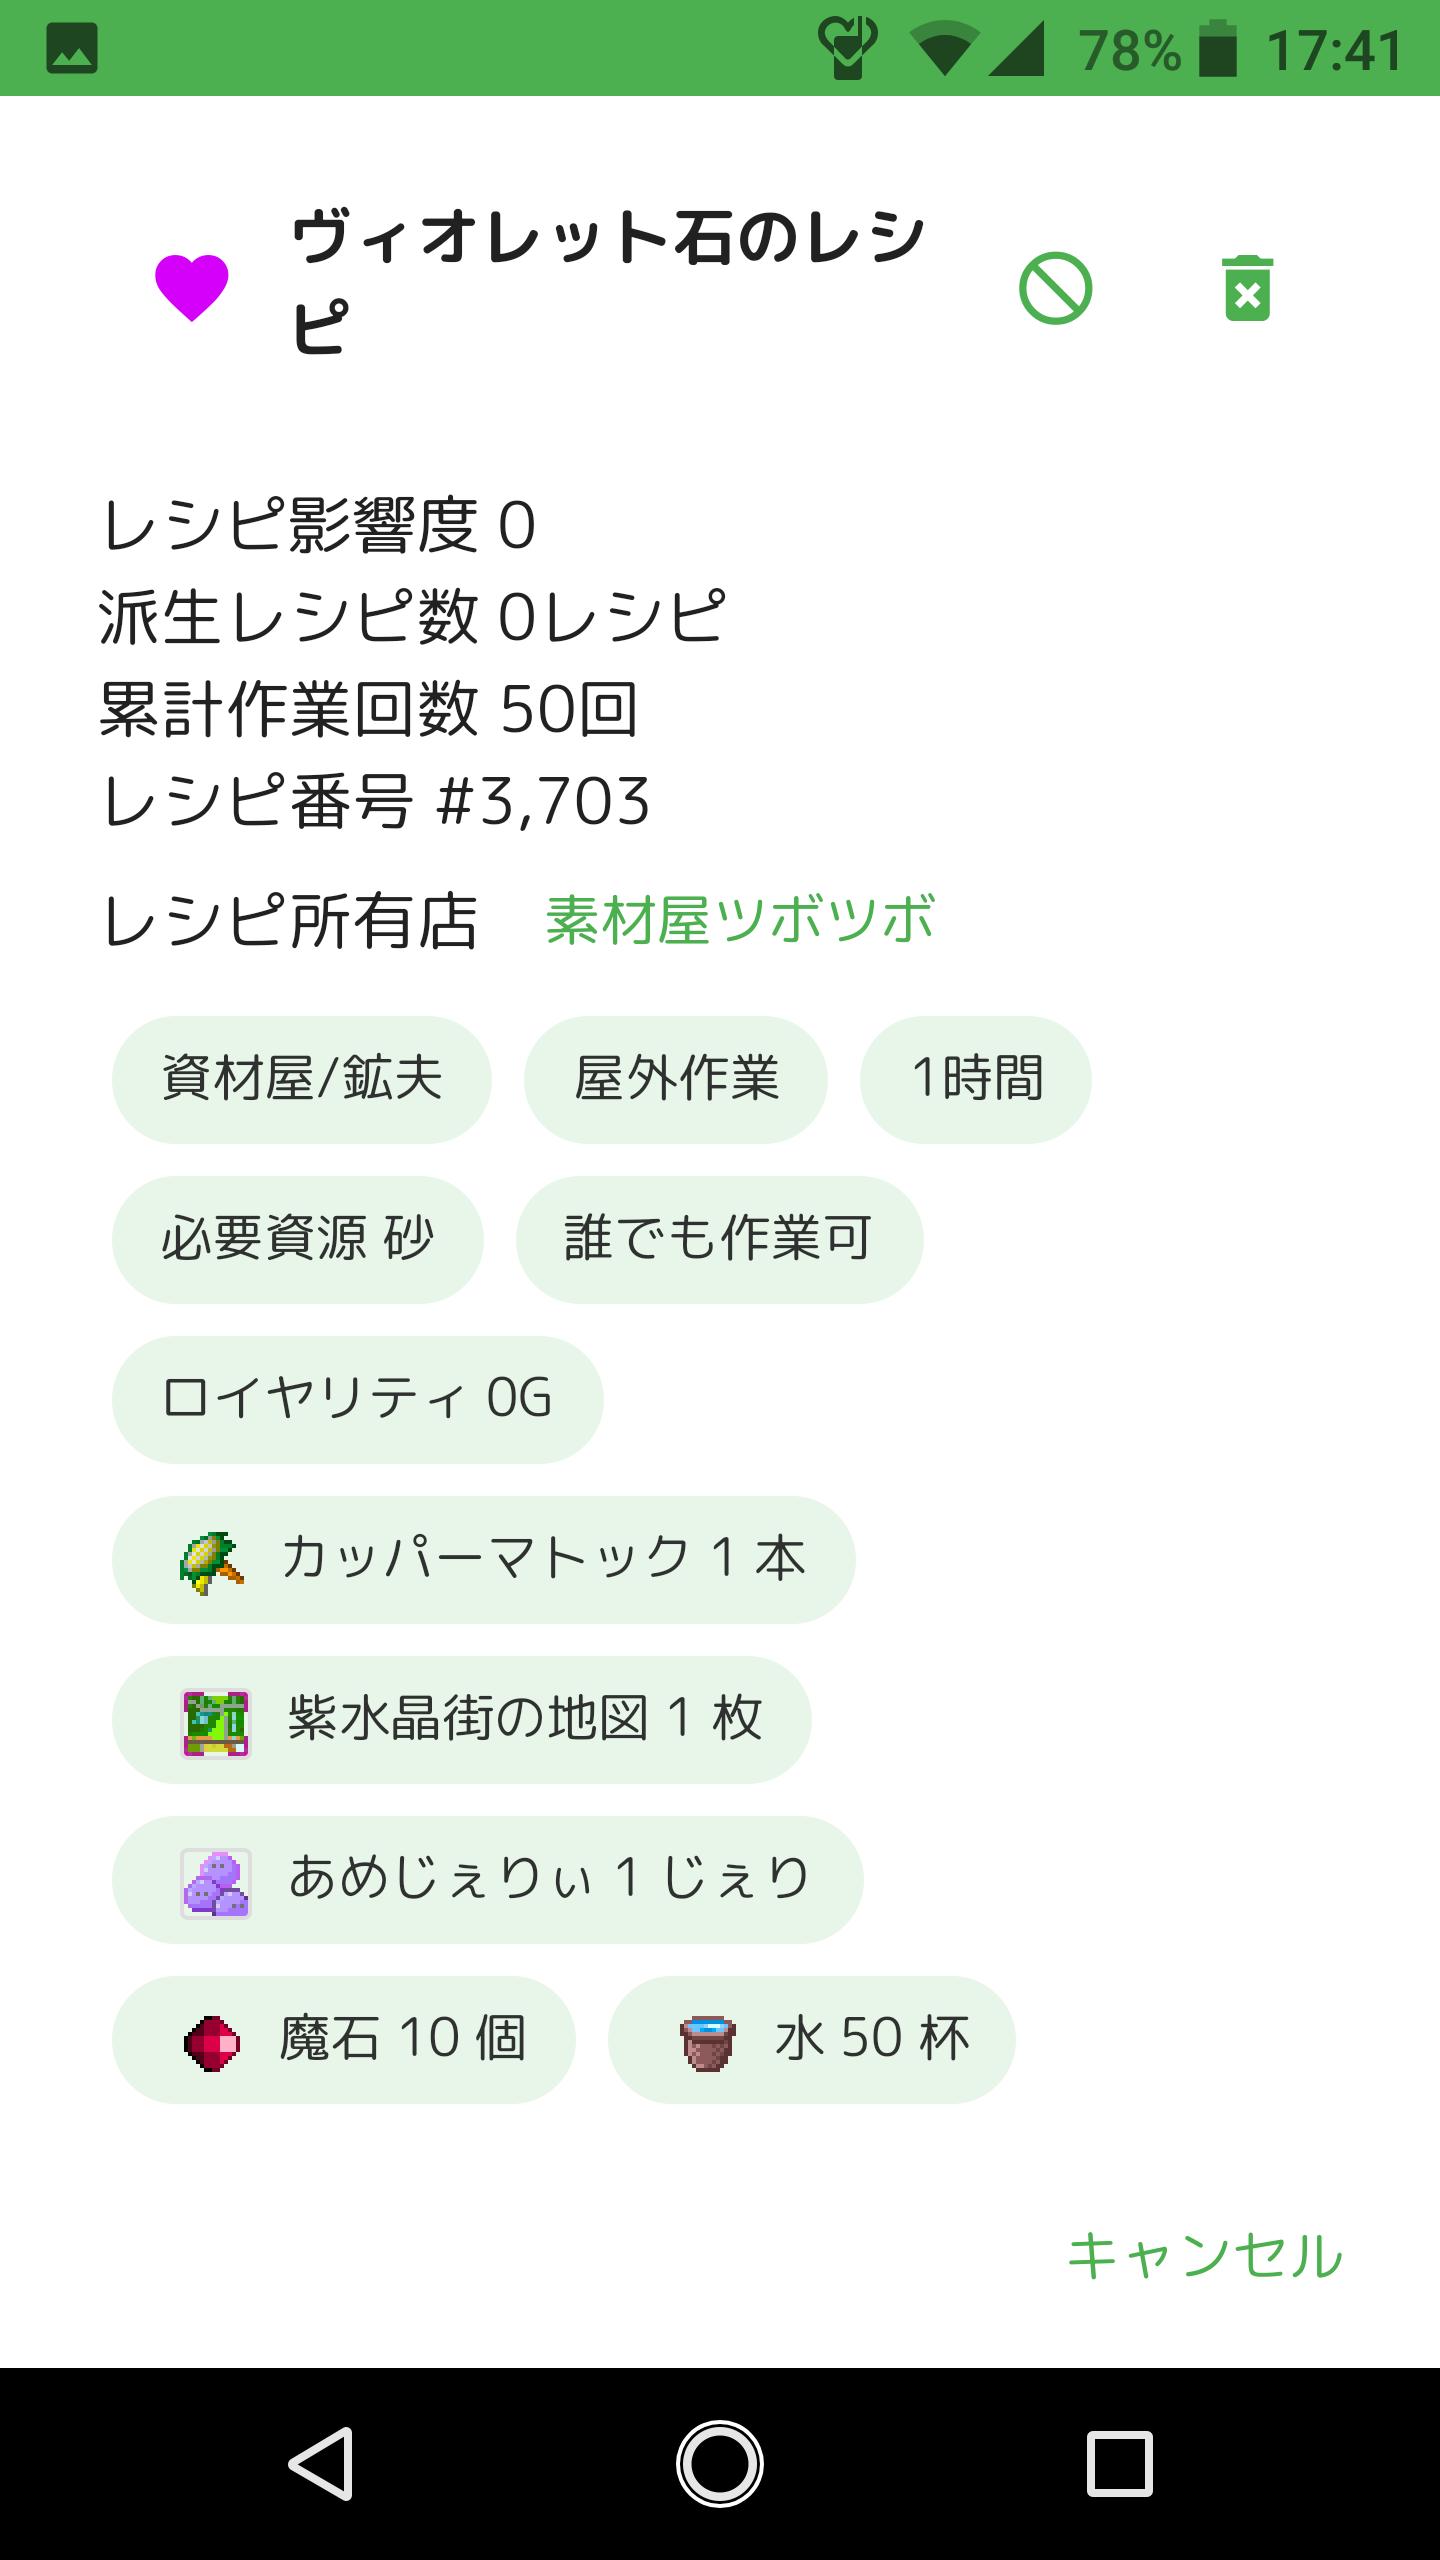 Screenshot_20180911-174141